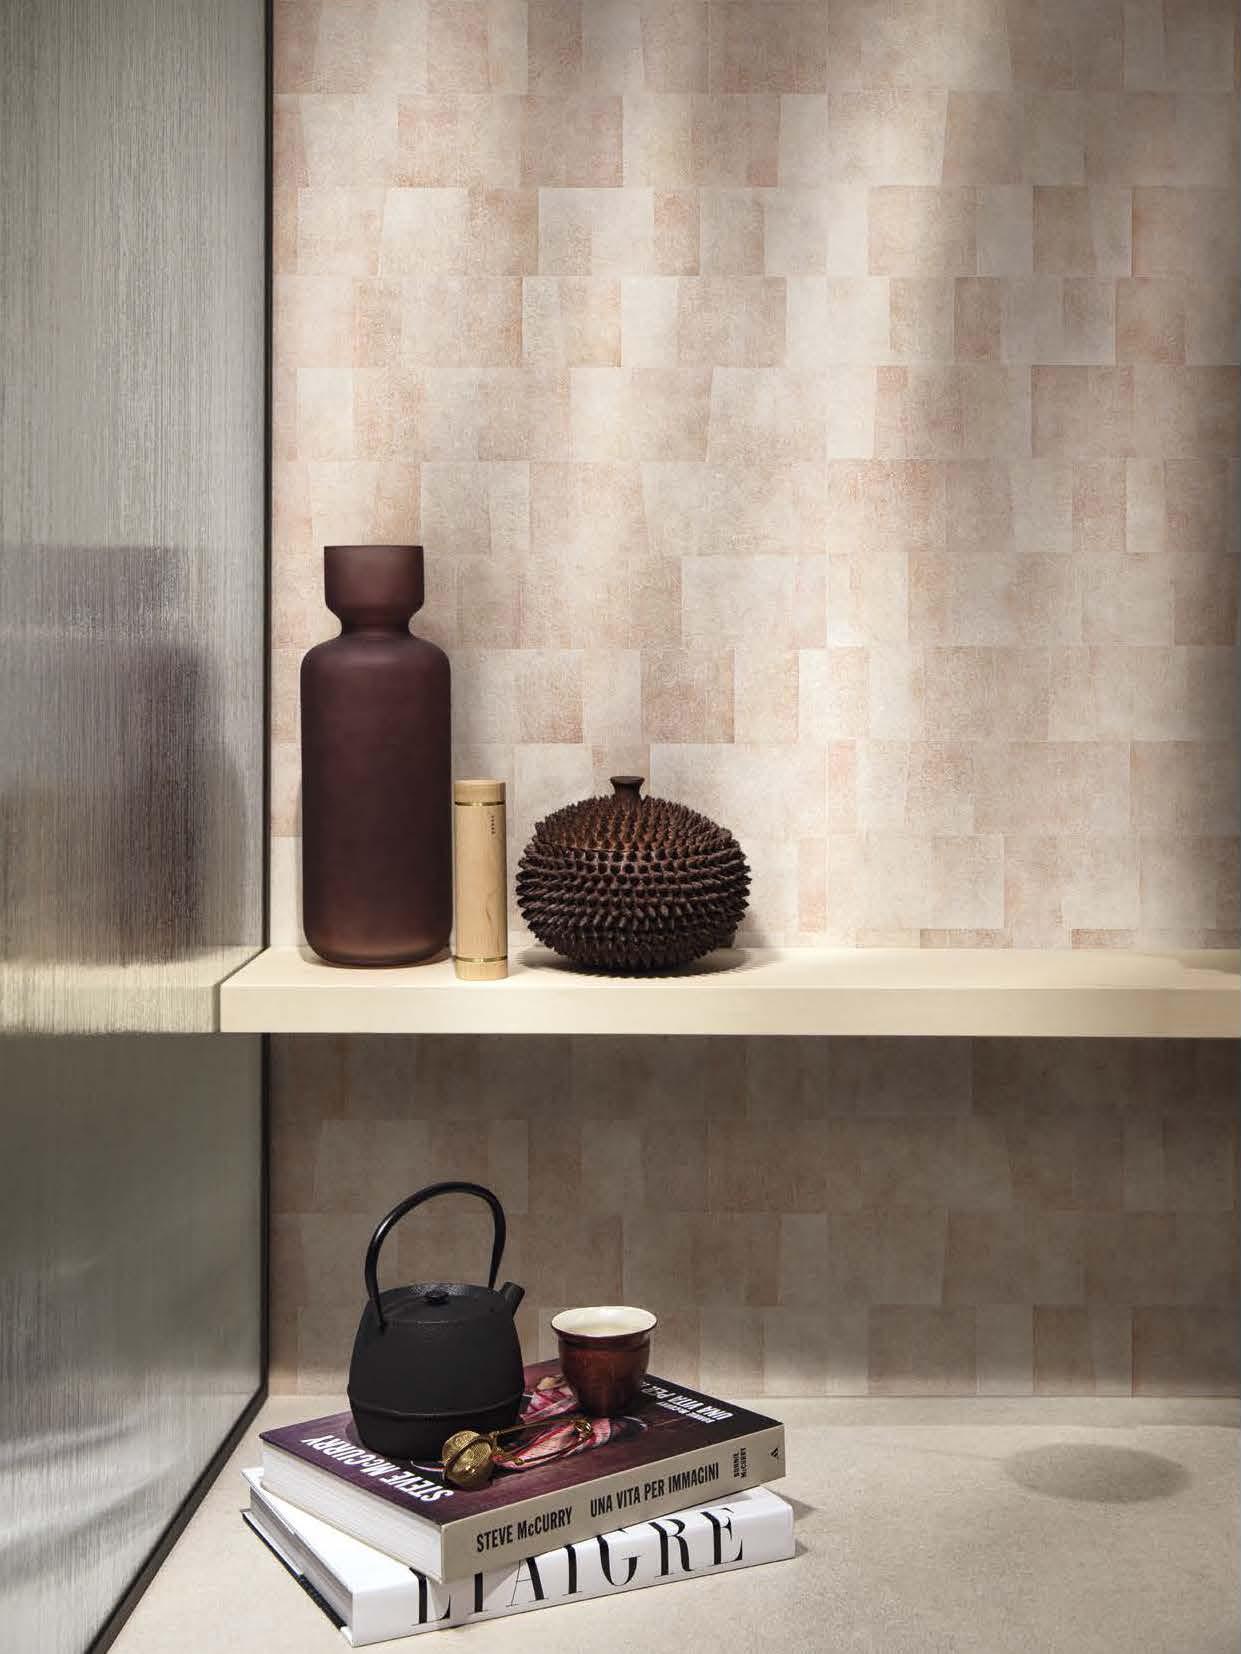 Florim Unveils 'Sensi Pigmenti' With an Installation at Milan Design Week 2021.